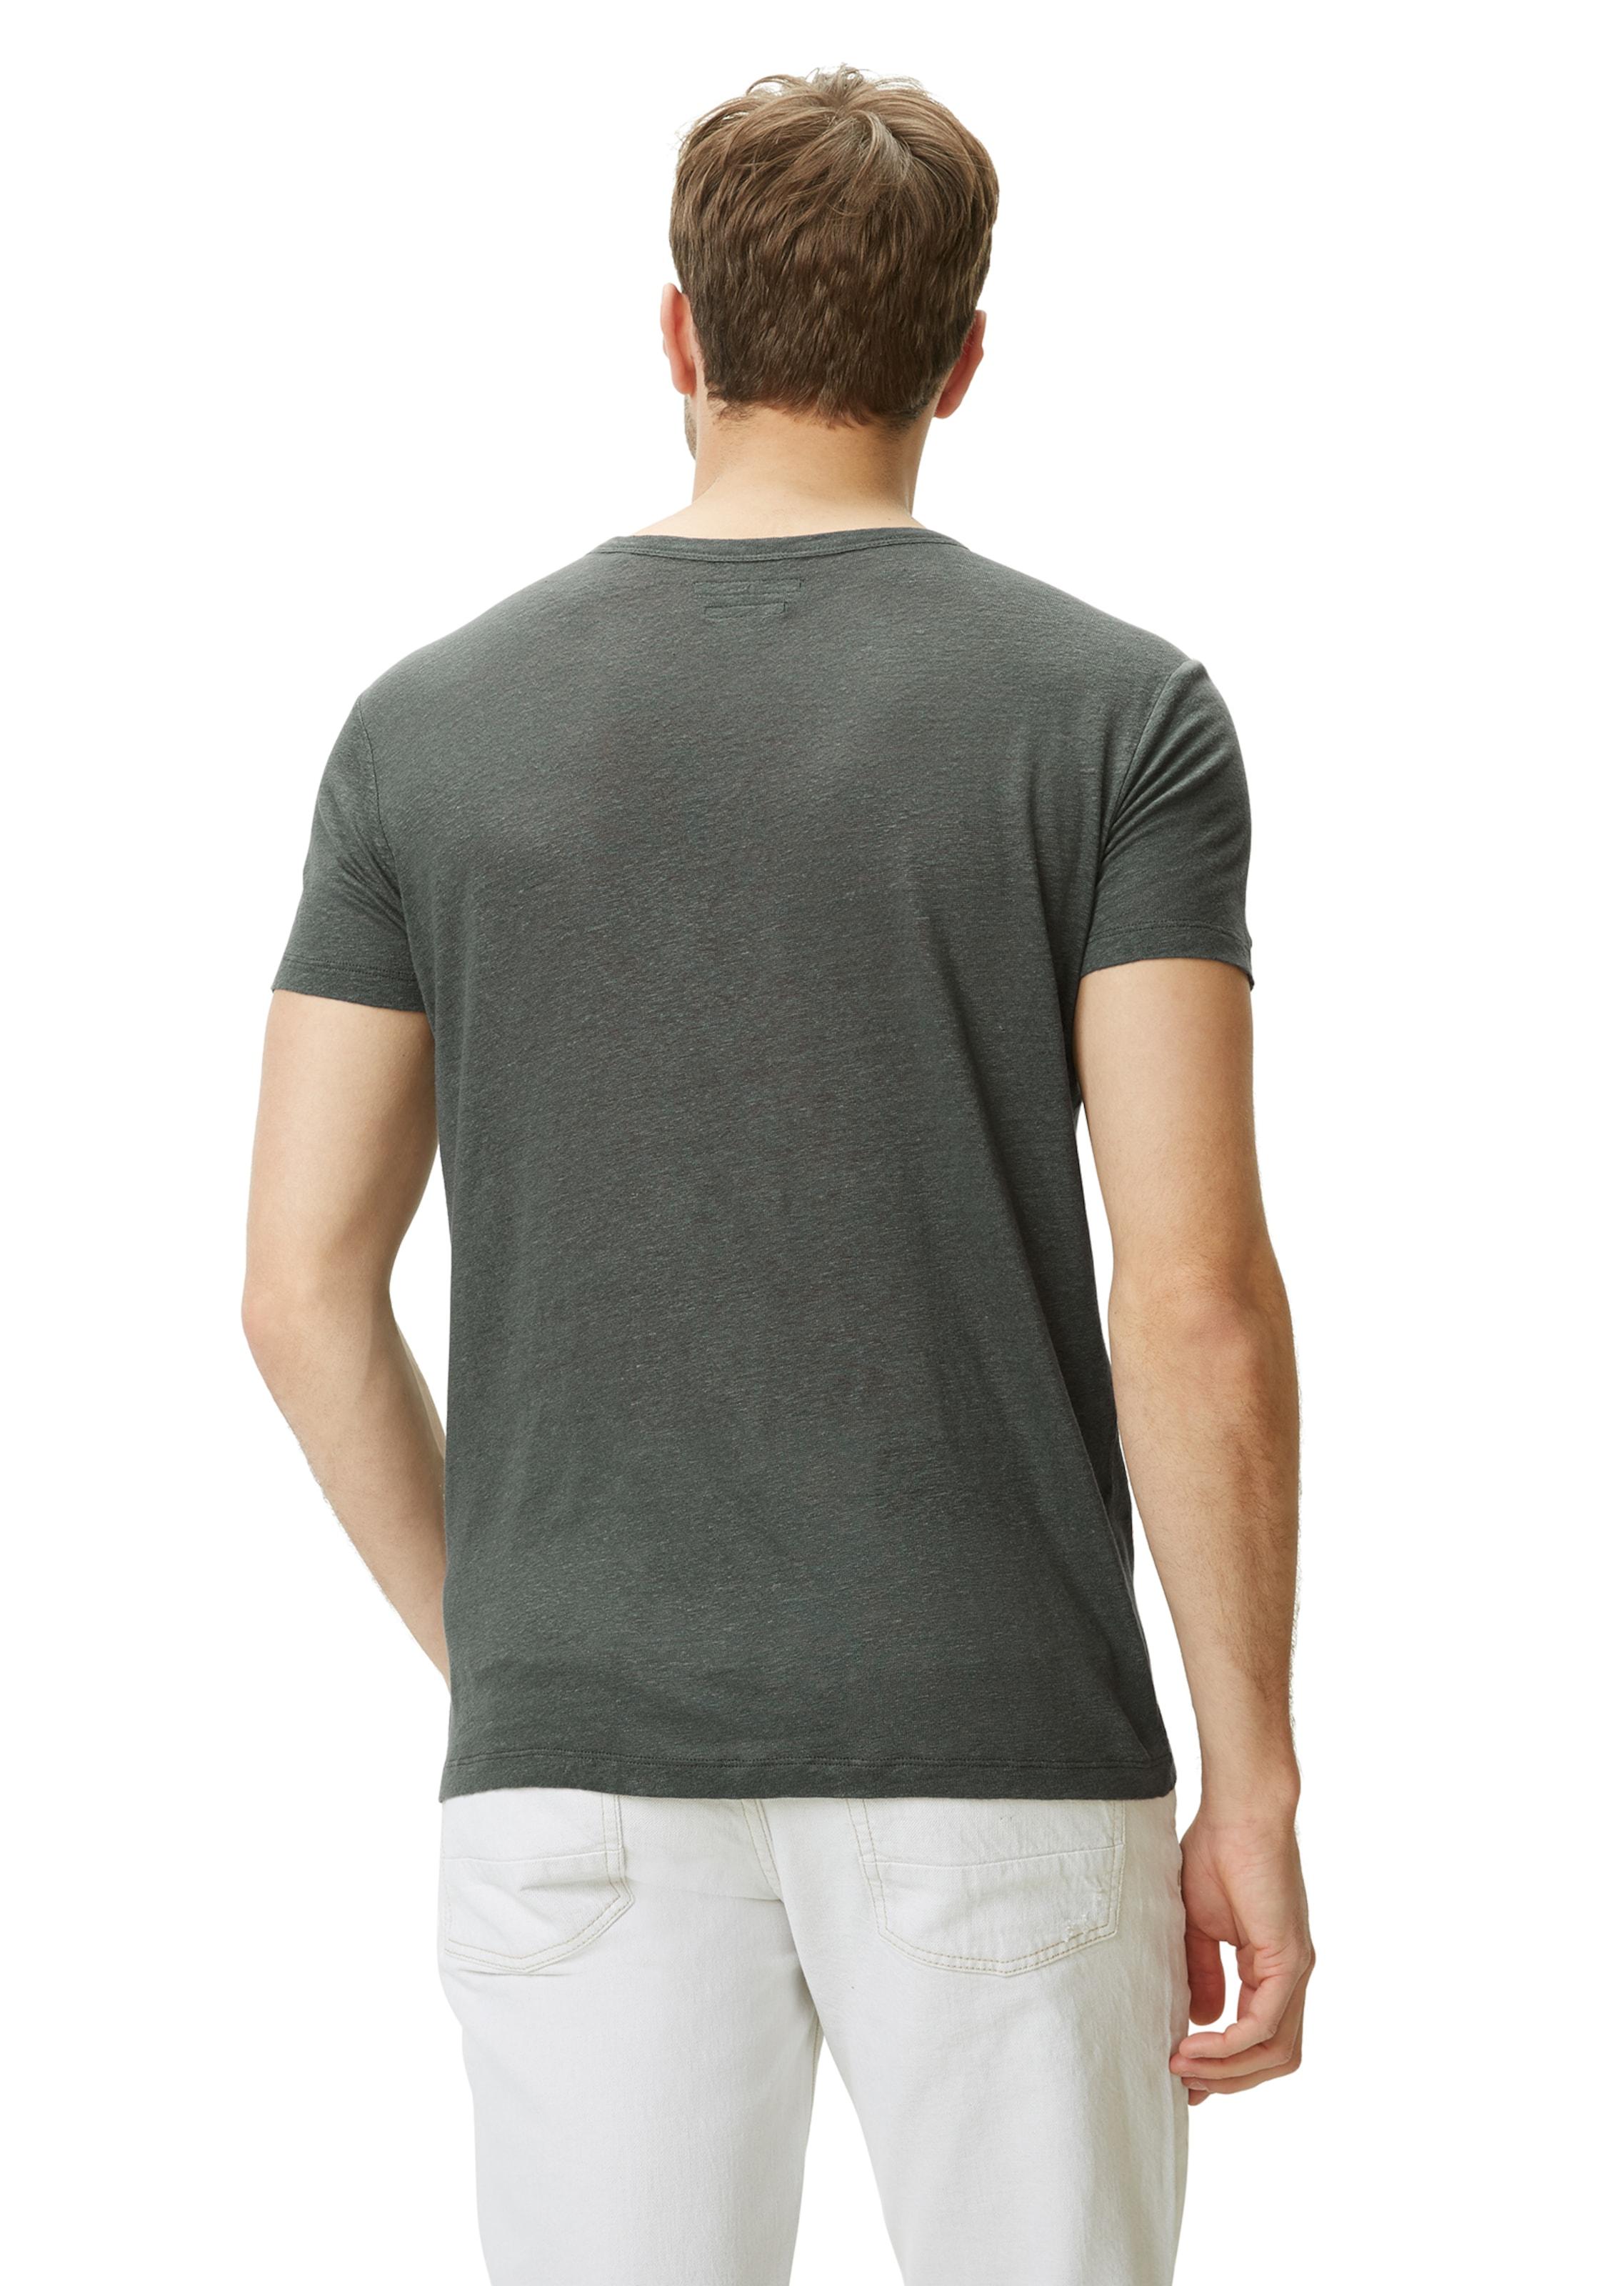 Marc Basaltgrau T In O'polo shirt j354LqRA